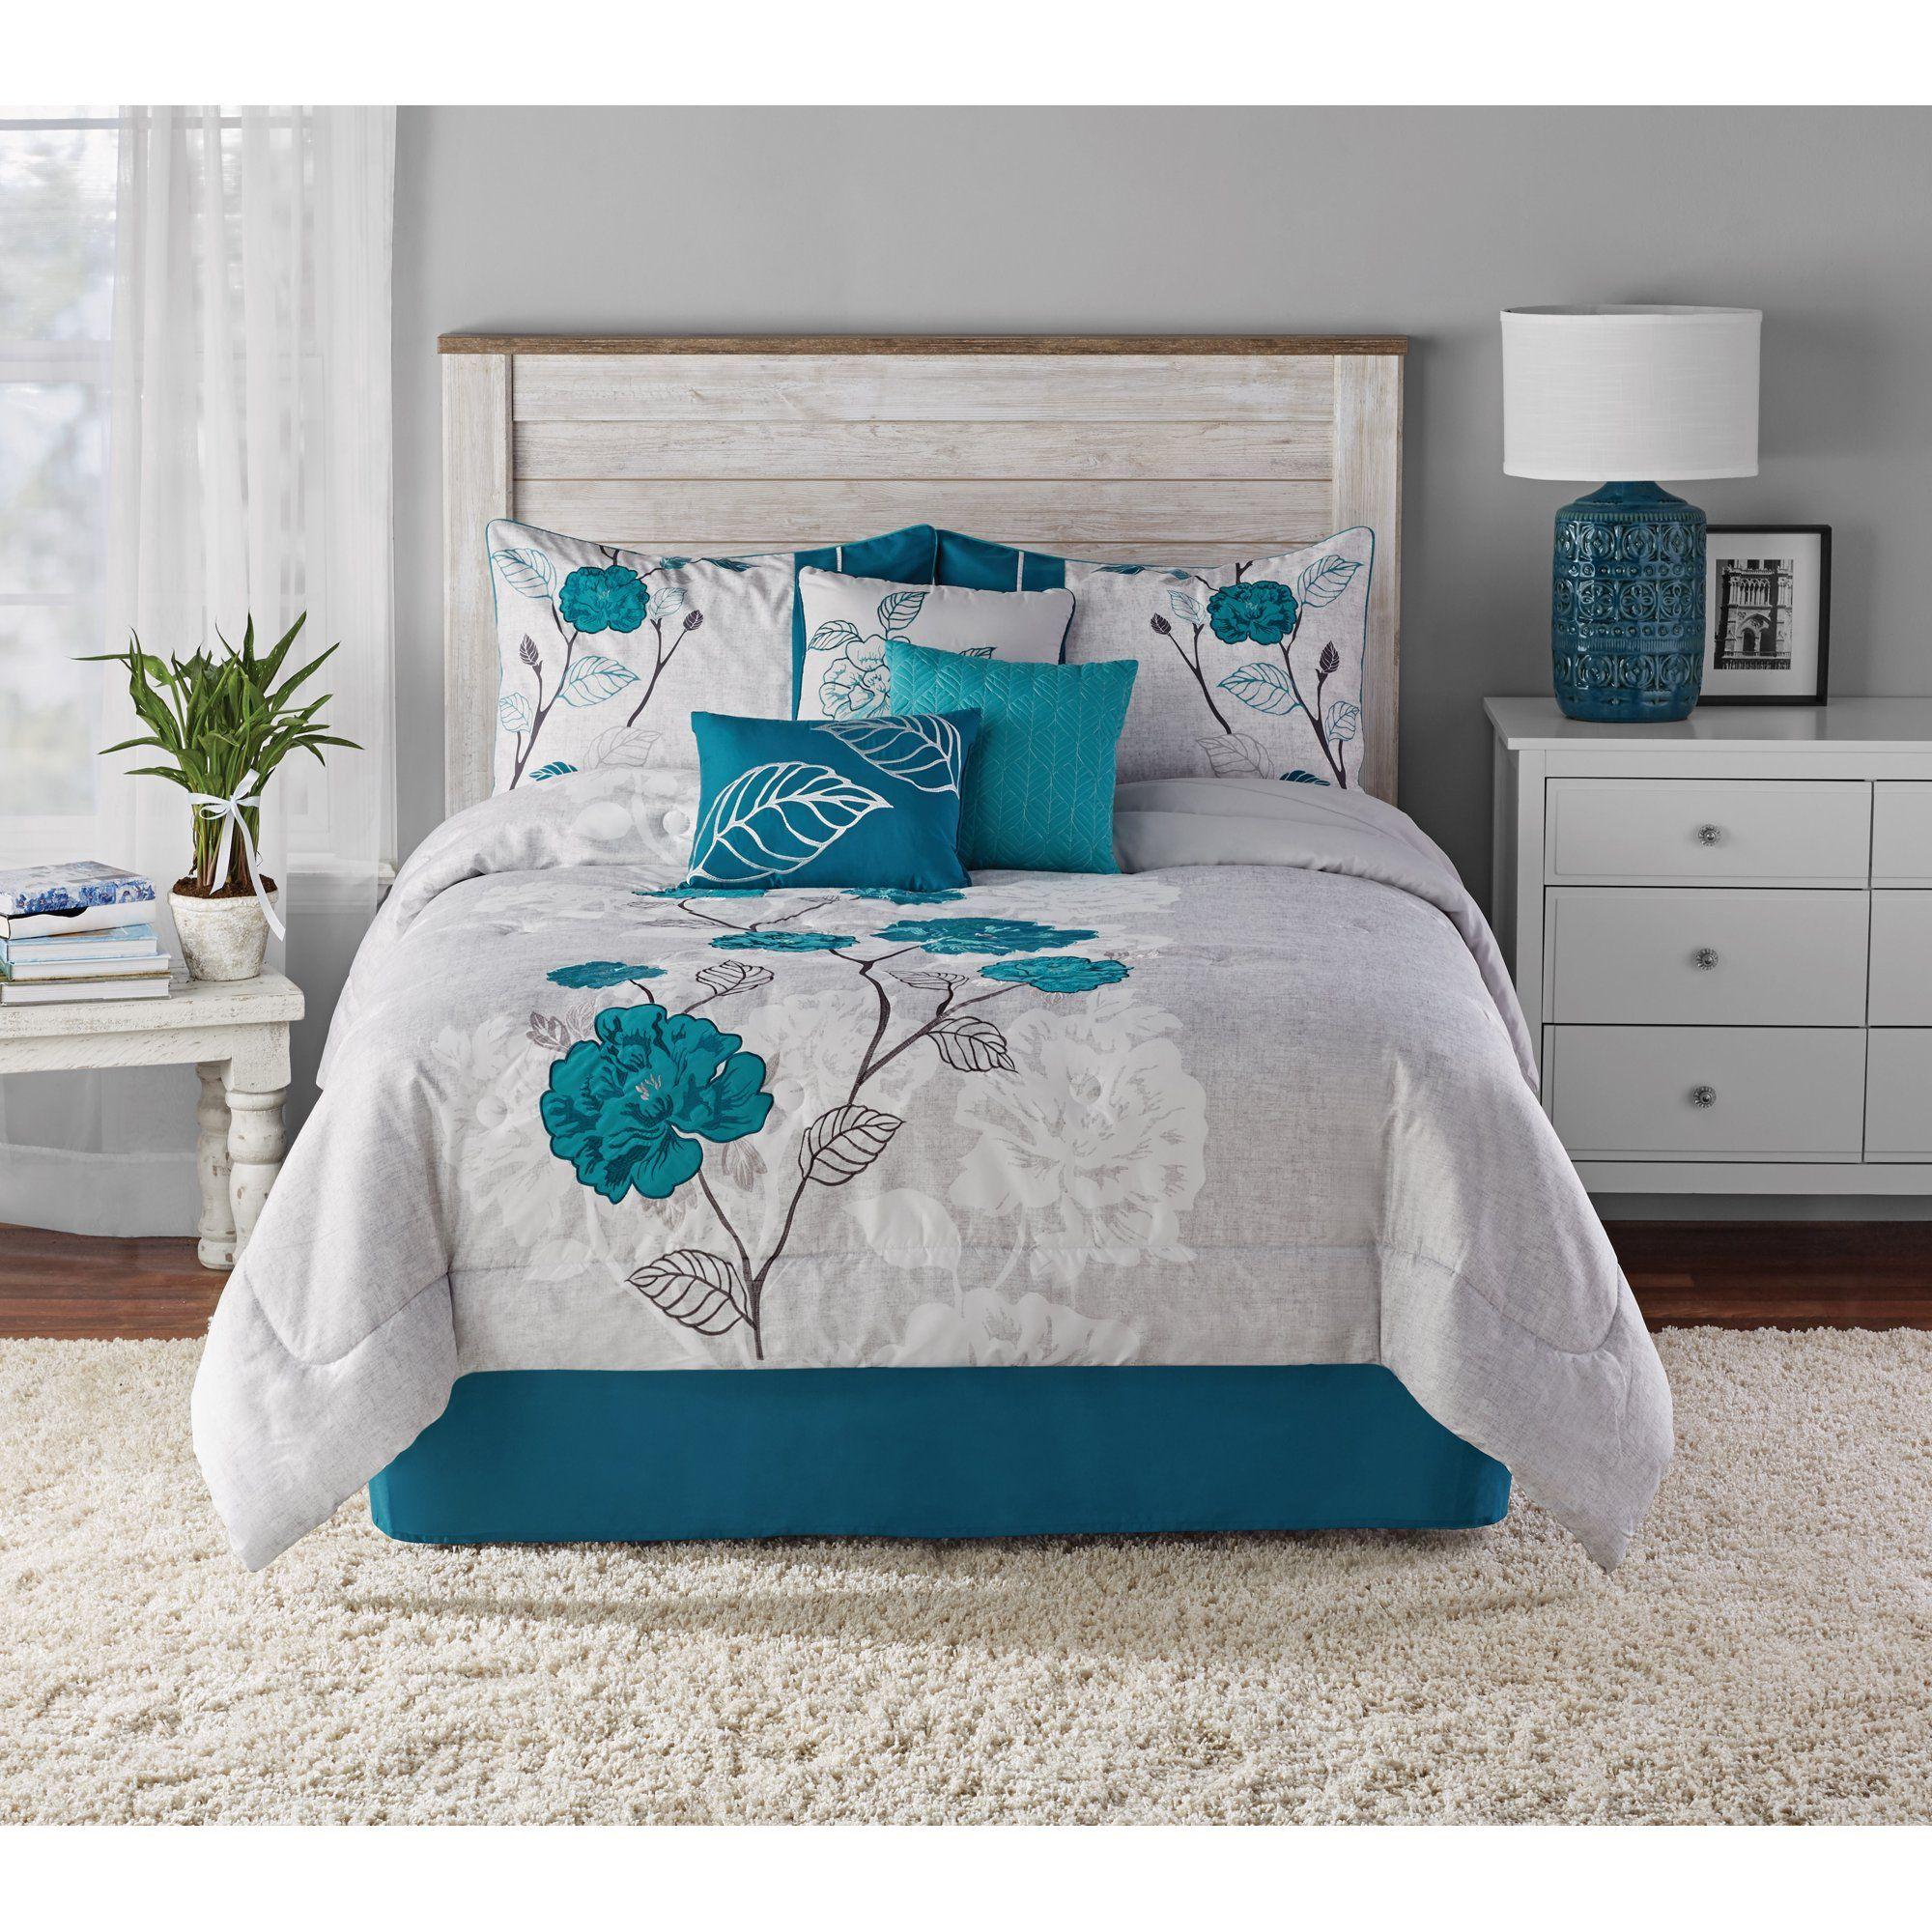 Mainstays Teal Roses Print And Applique 7 Piece Comforter Set King Walmart Com In 2020 Teal Bedroom Decor Teal Bedroom Comforter Sets